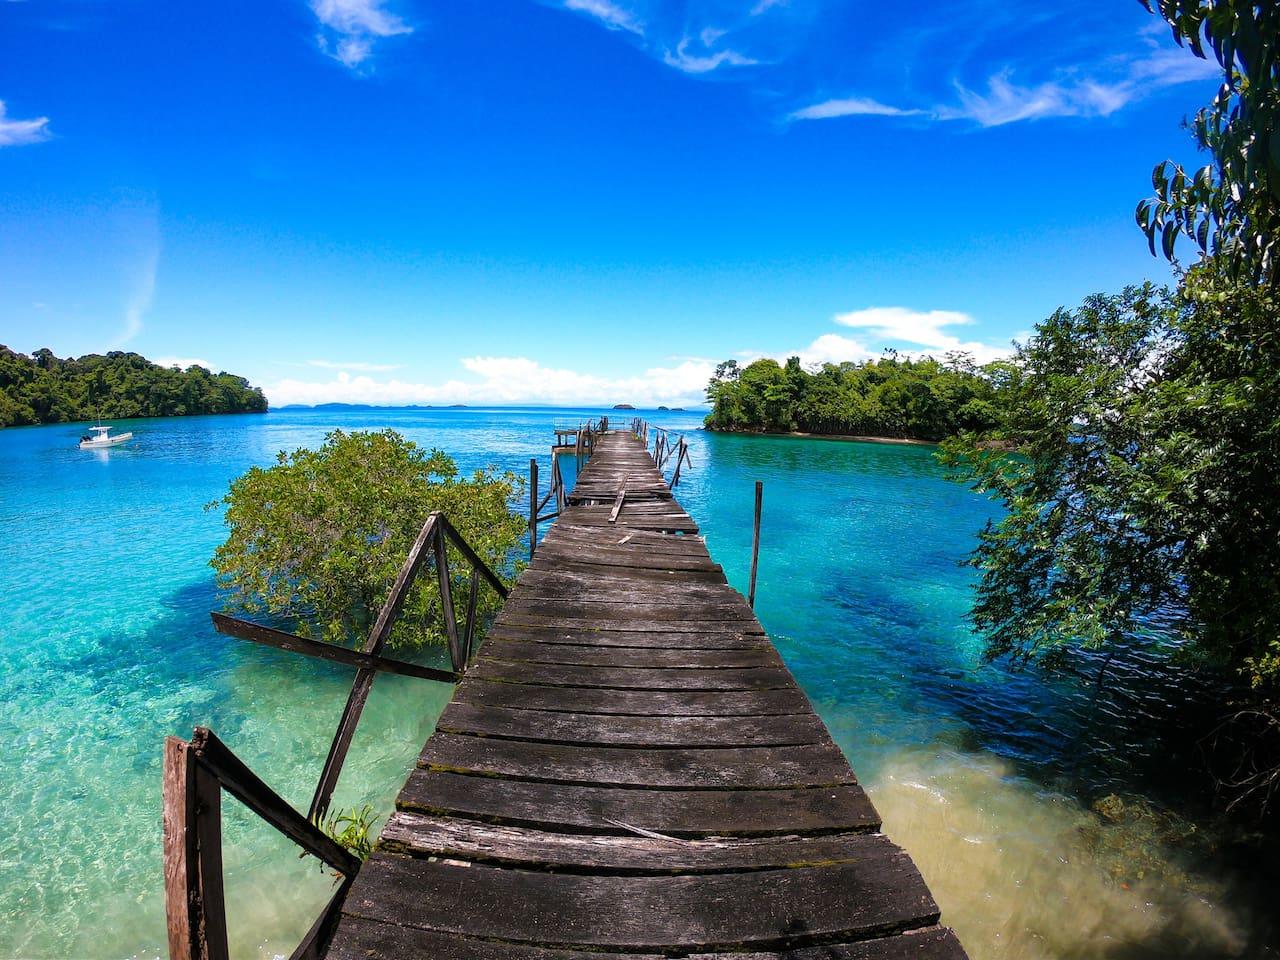 Parque Nacional Coiba, ofrecemos tours a la isla de ecoturismo